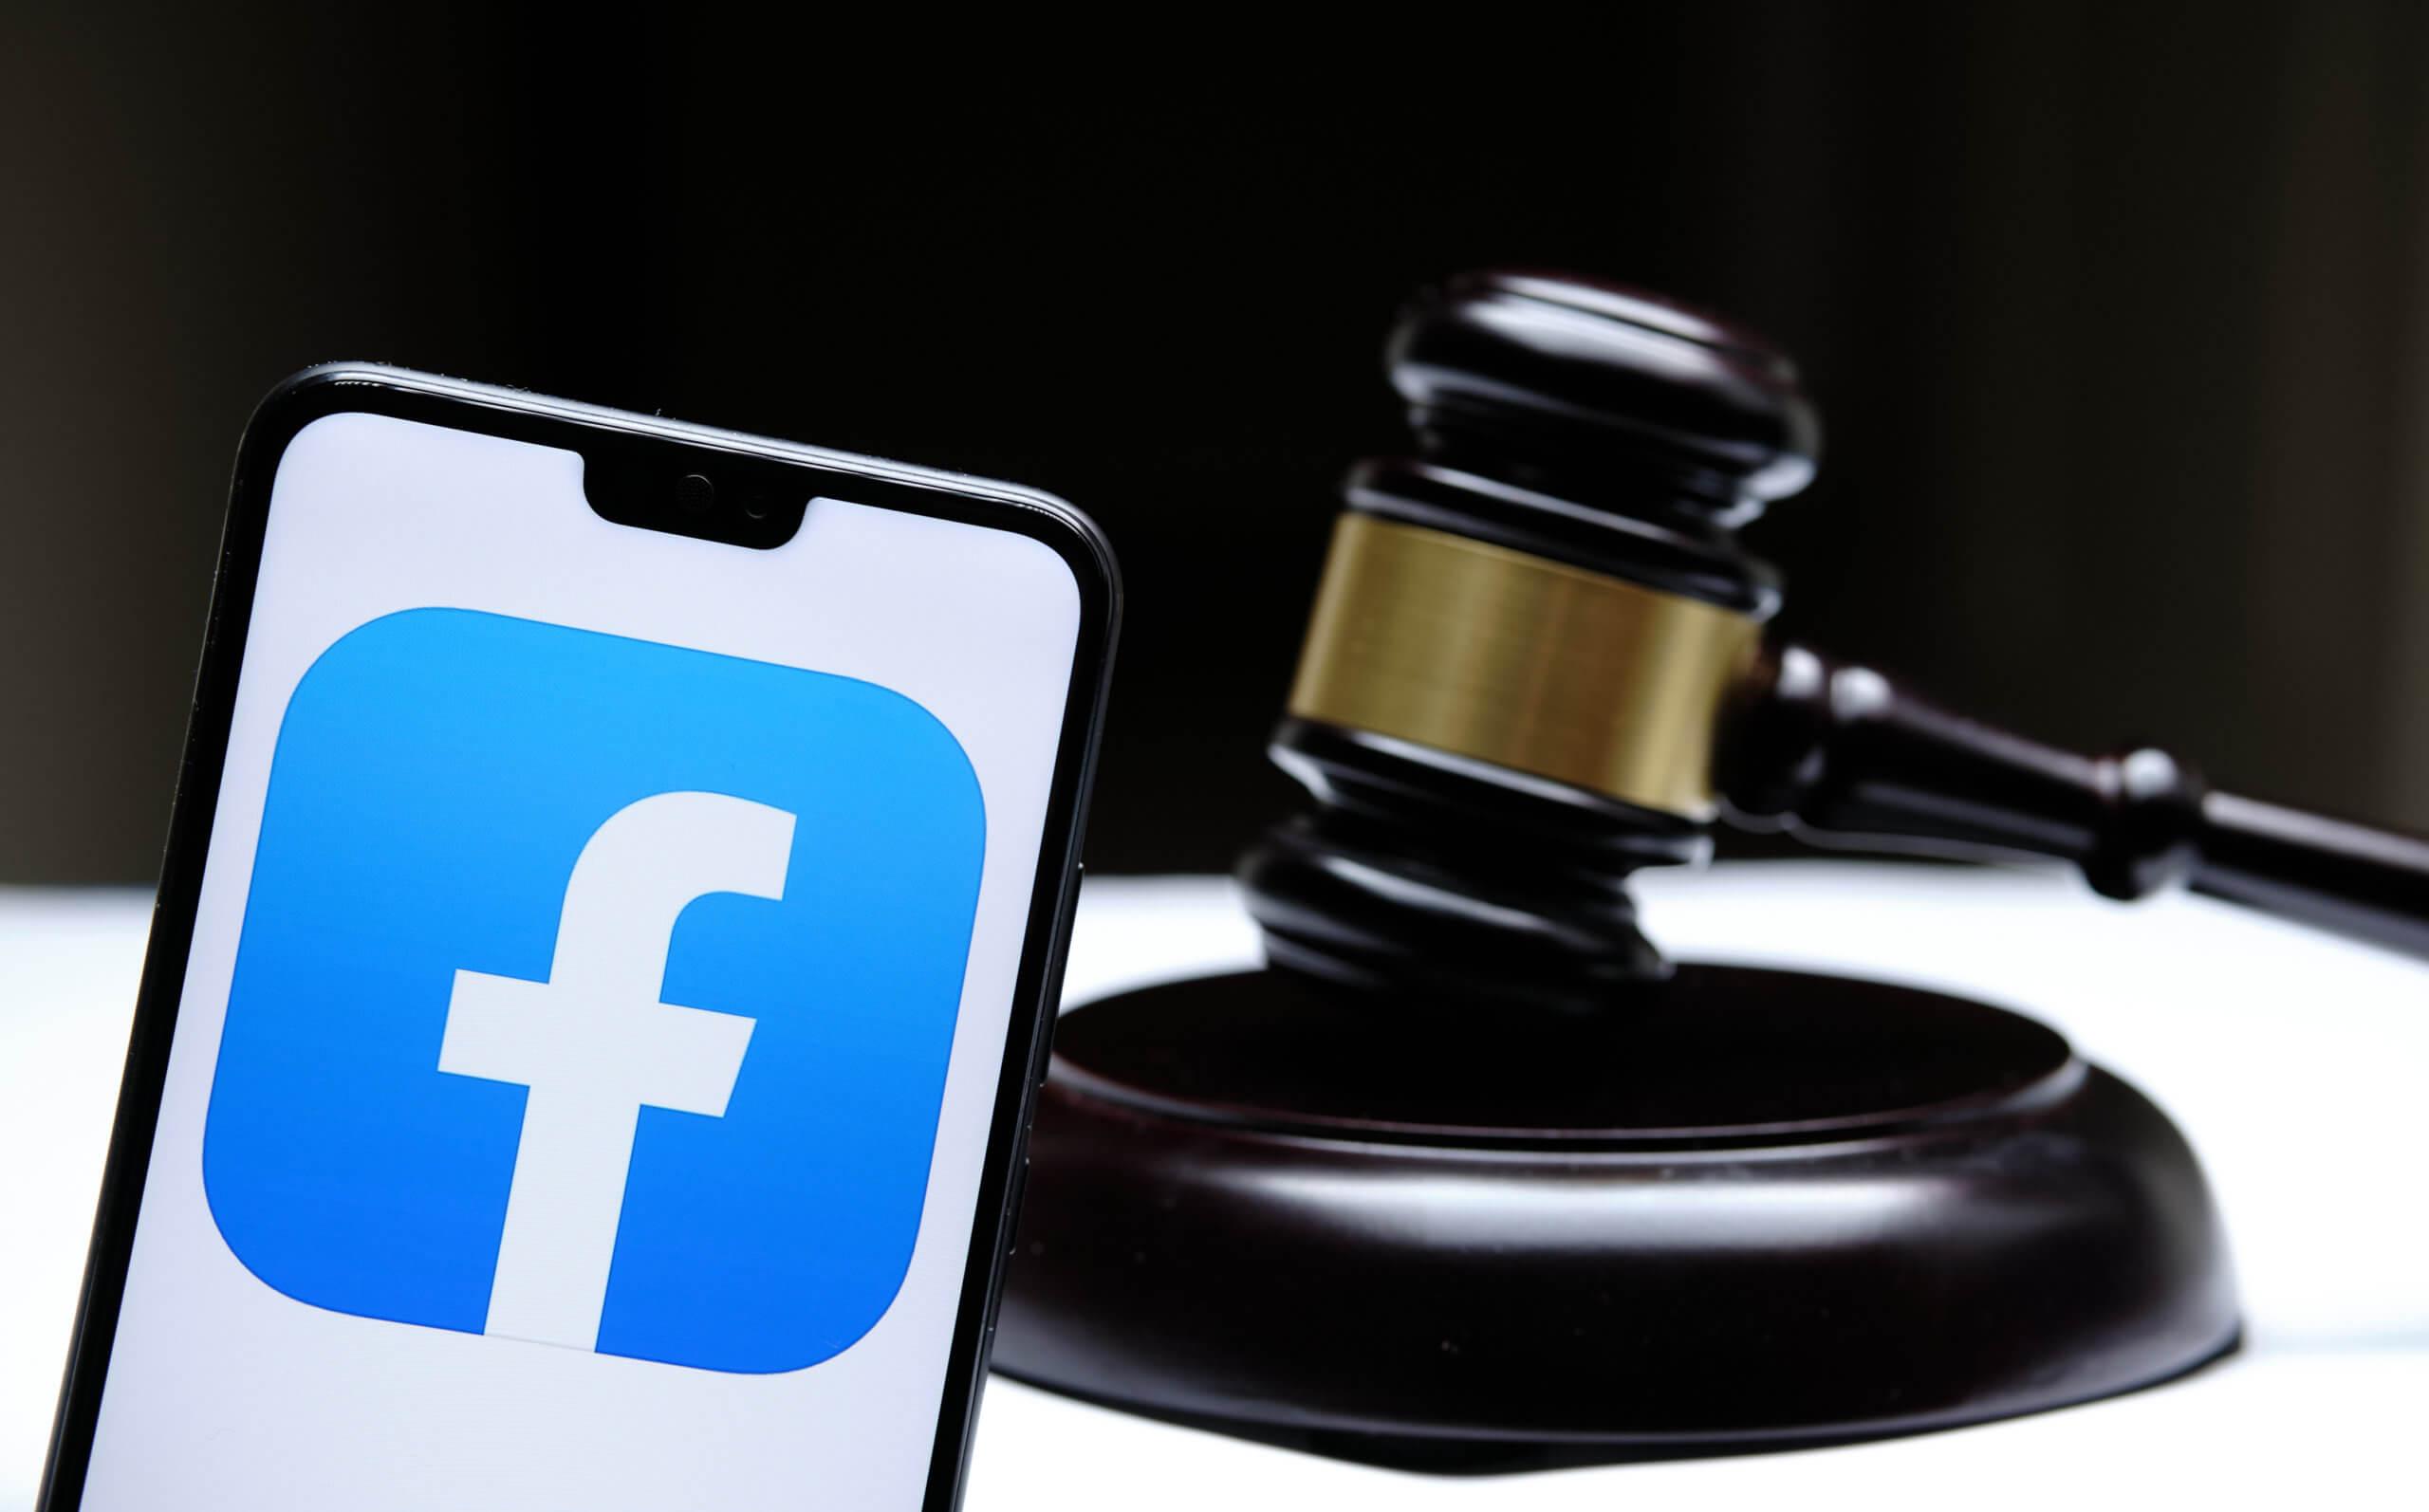 Facebook hits $1 trillion market cap after antitrust ruling